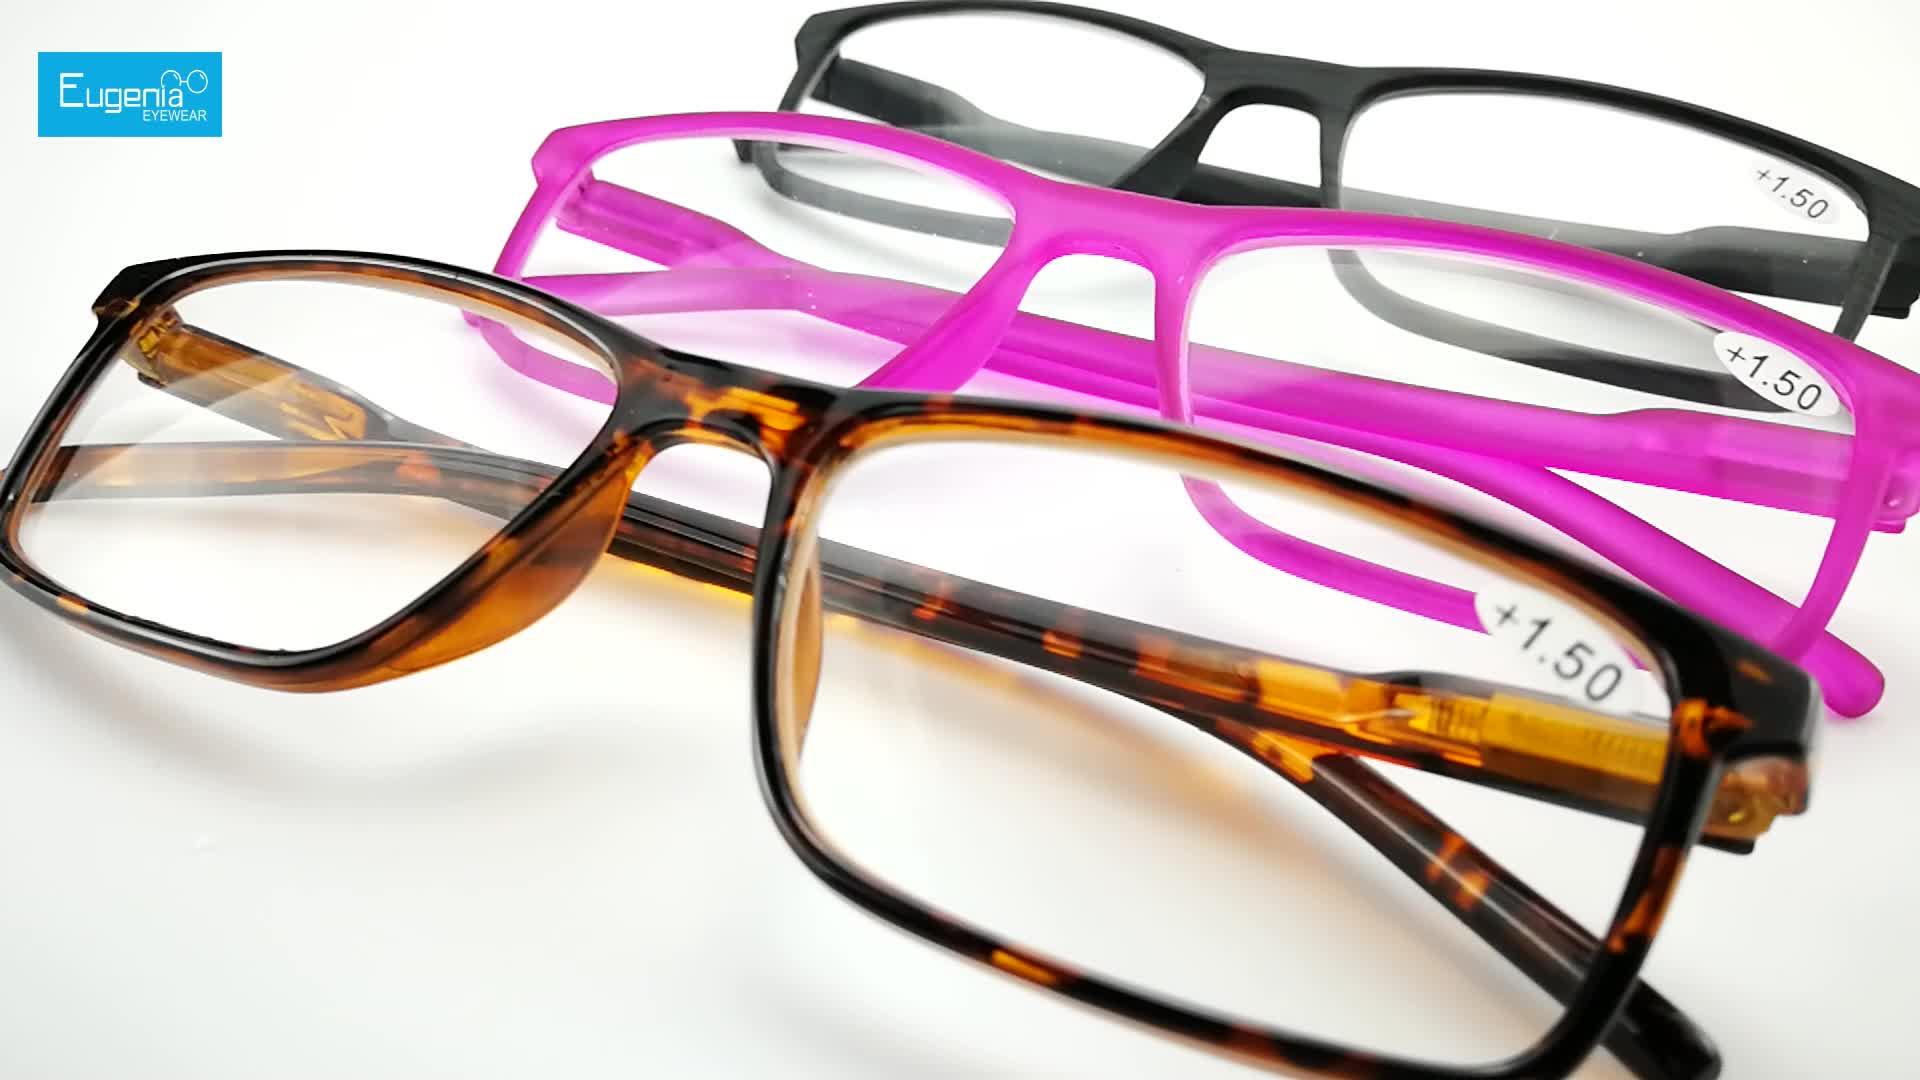 EUGENIA 여러 색상 높은 표준 품질 고무 커버 멀티 컬러 gafas de lectura 독서 안경